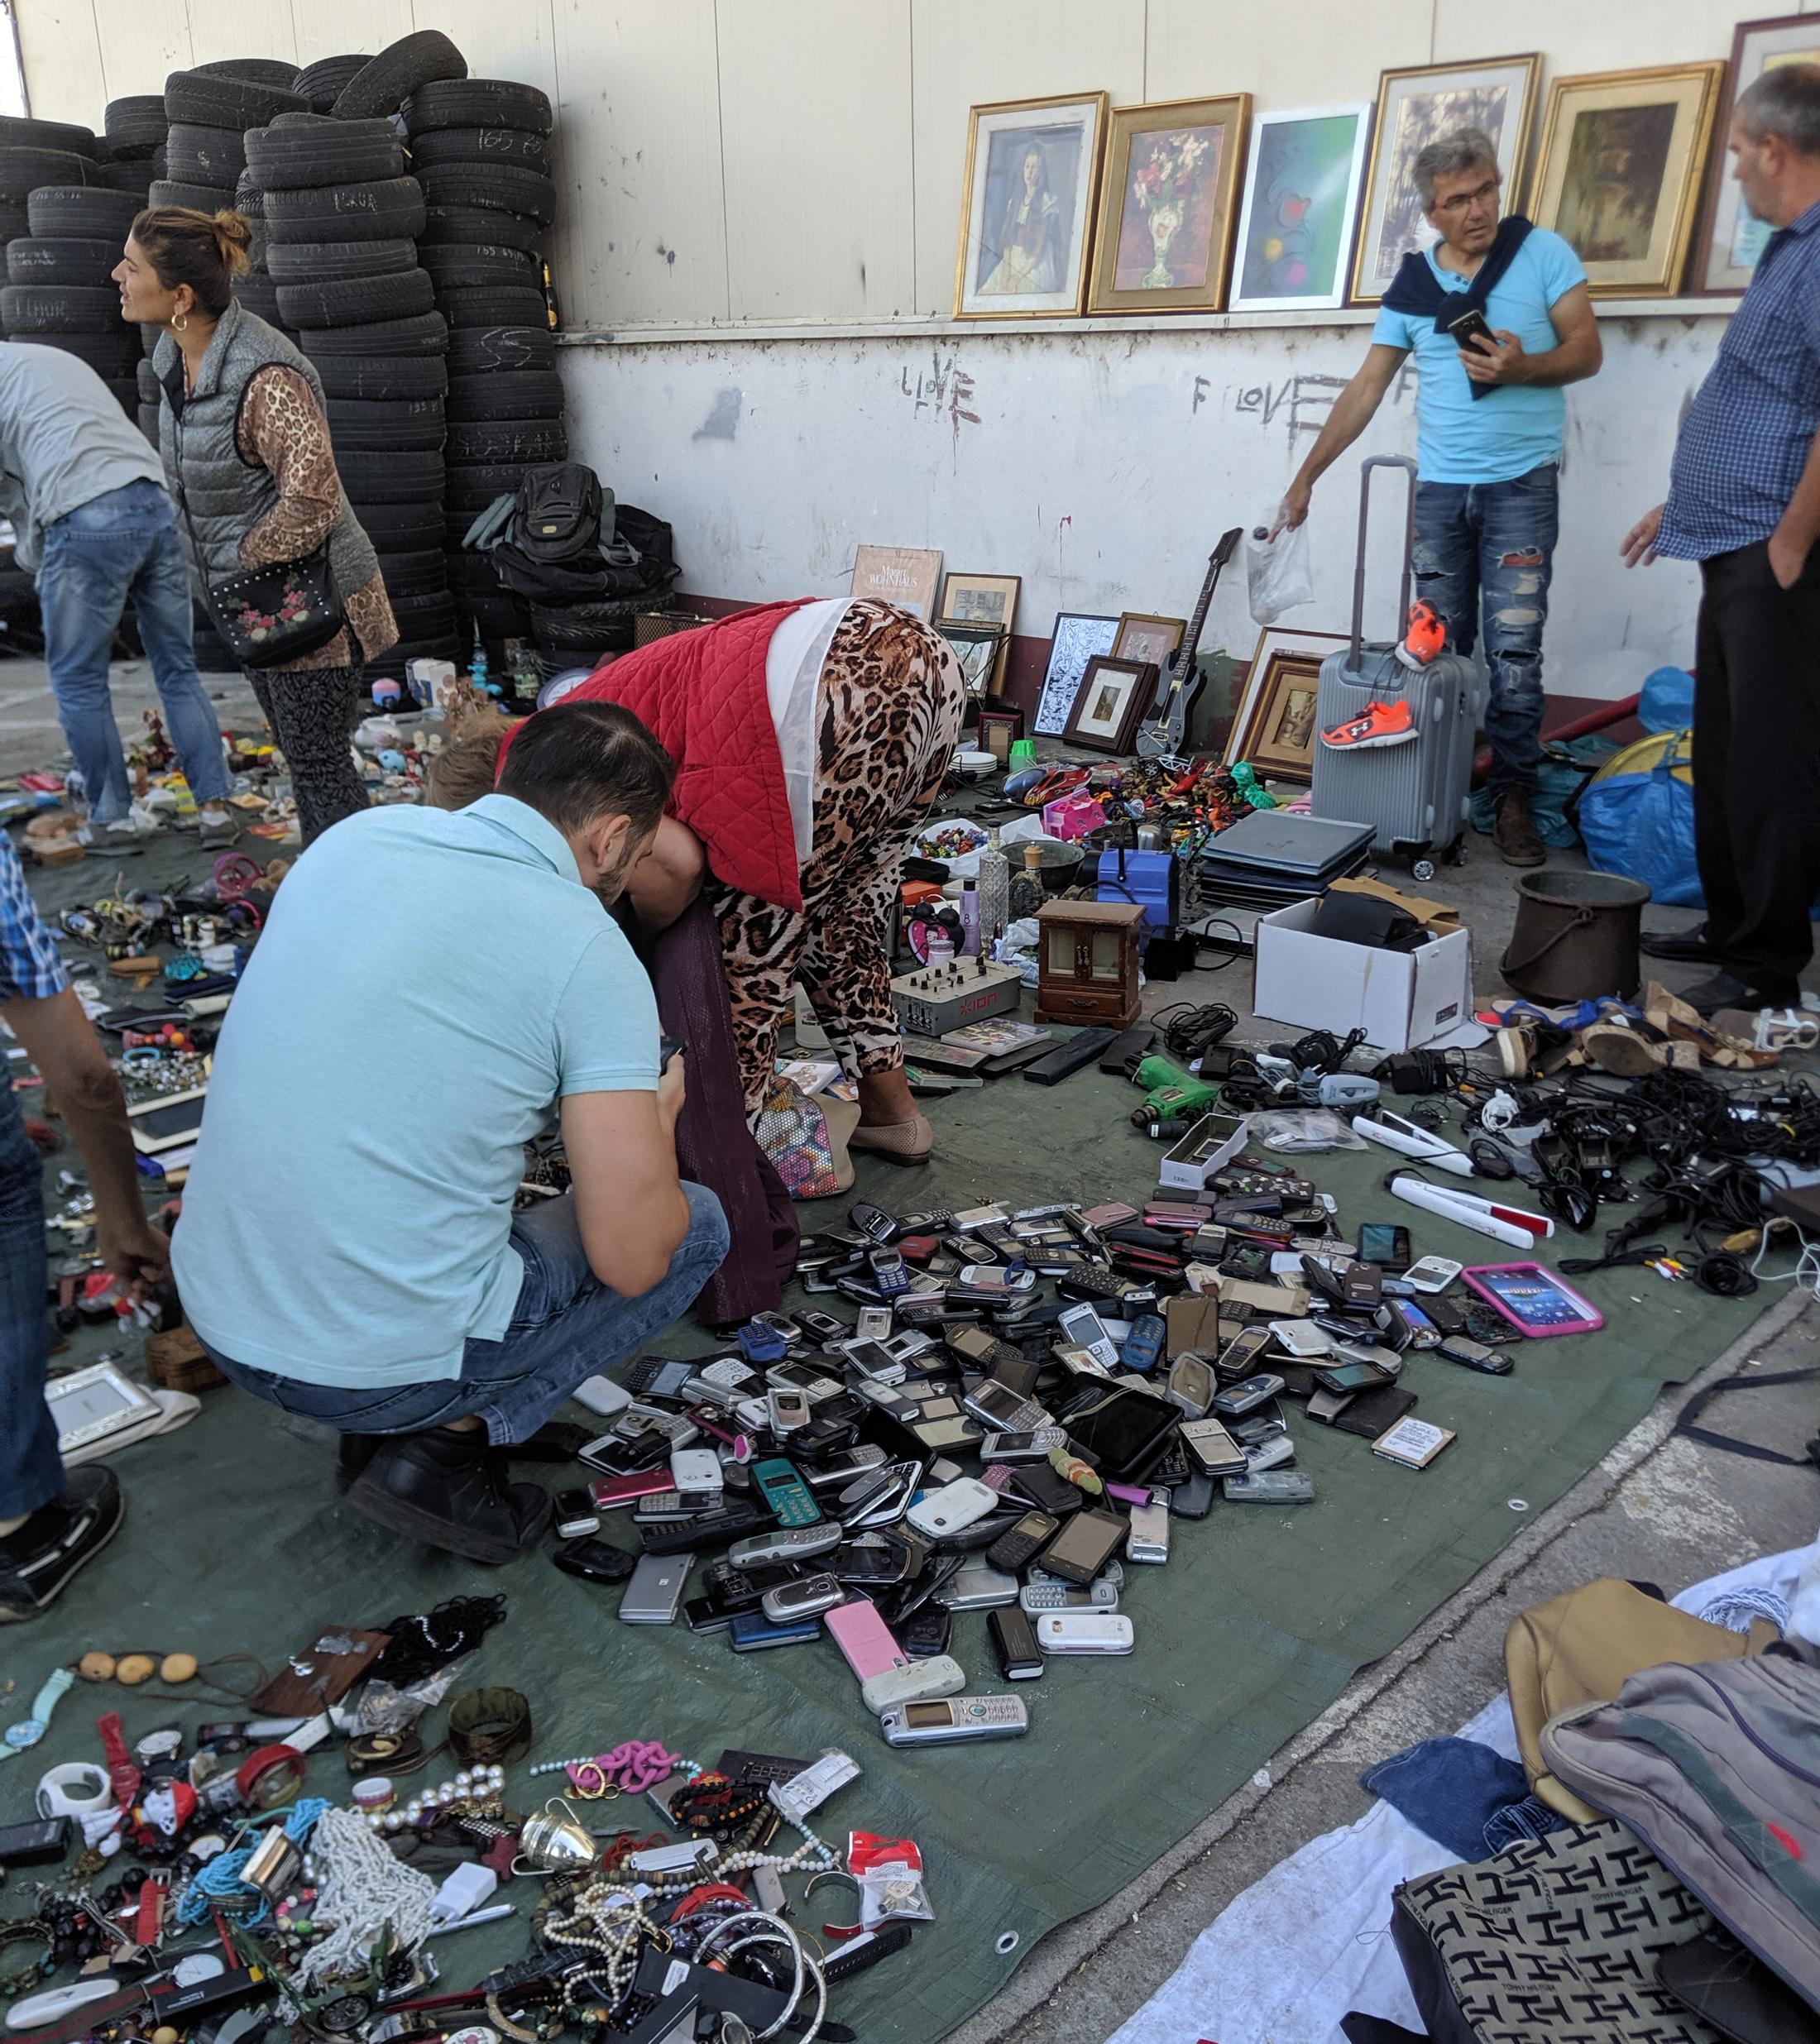 A flea market seller's goods spread out on a parking lot.